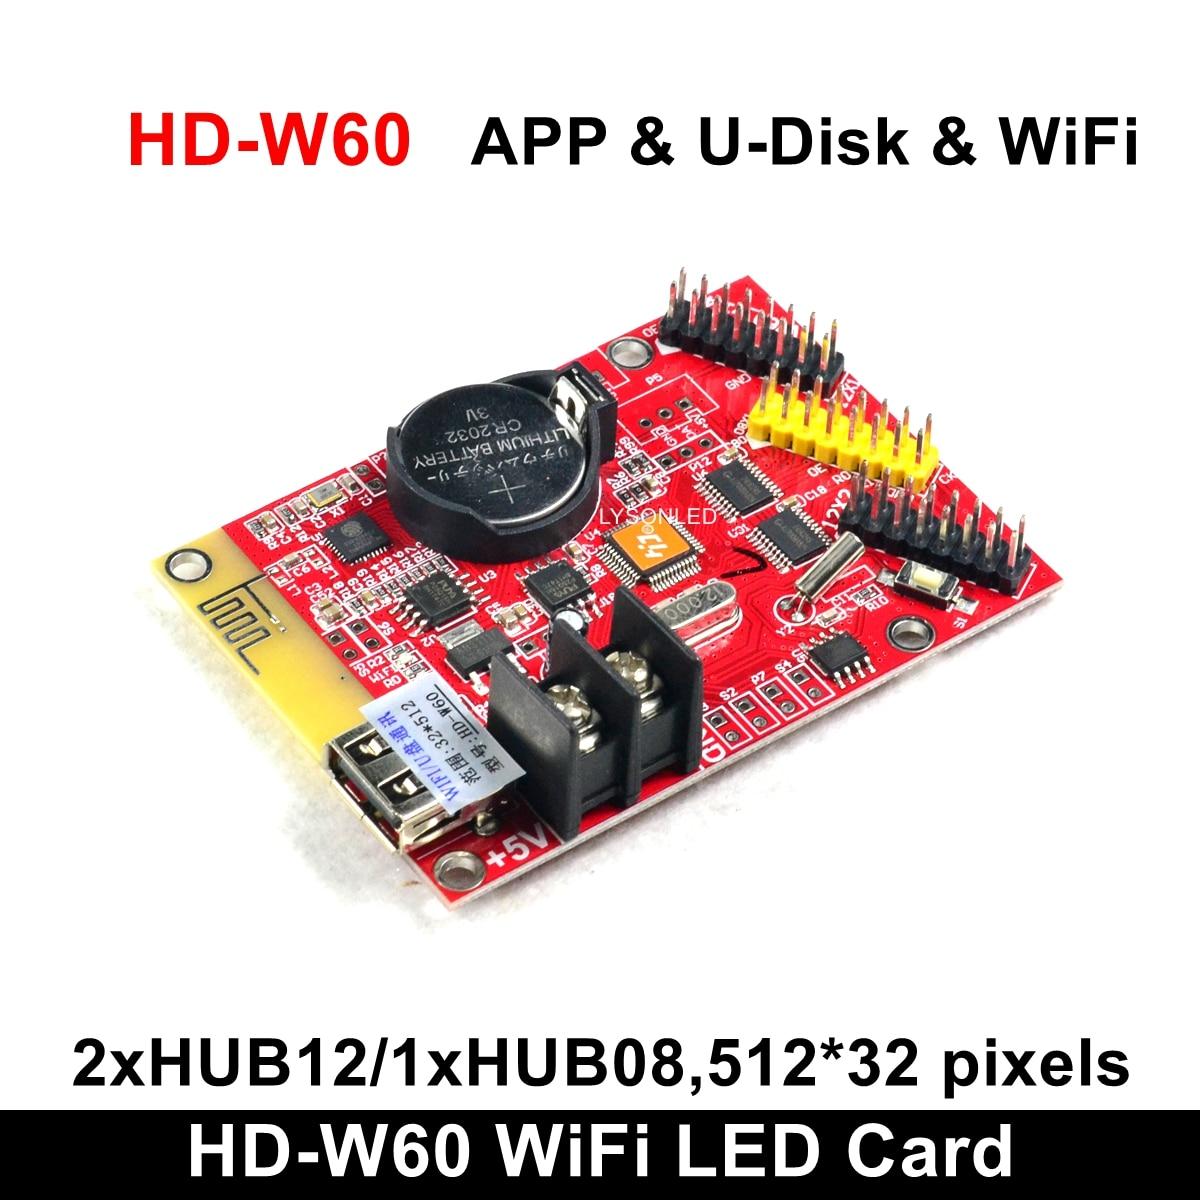 Free Shipping Huidu HD-W60 U-Disk WiFi Single Dual Color LED Display Control Card